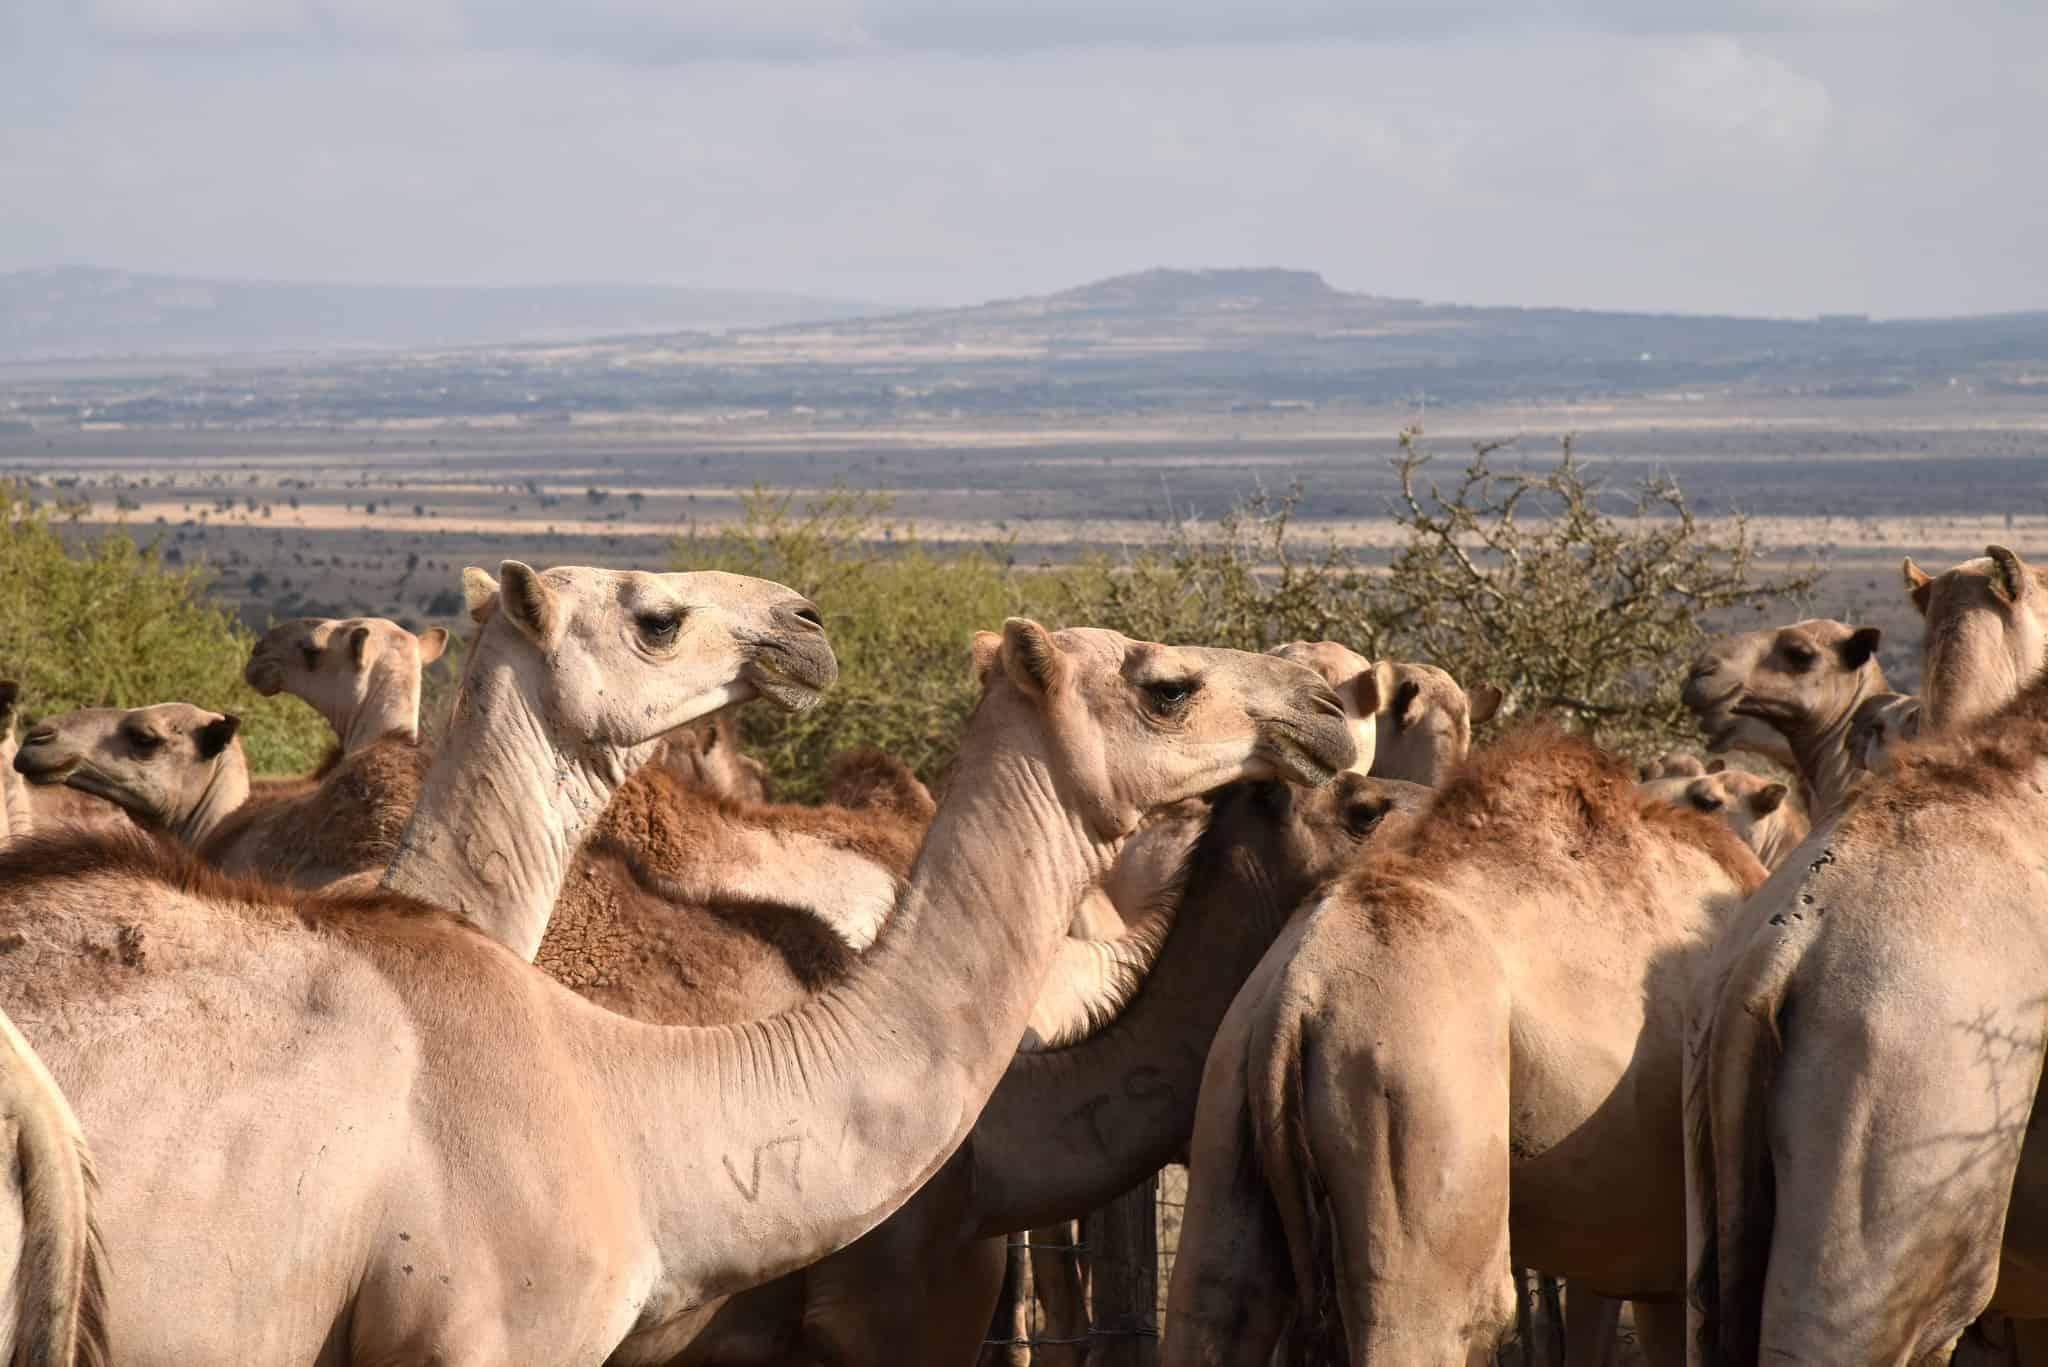 Camels drinking at a water pan in Wajir county in Kenya (photo credit: ILRI/George Wamwere-Njoroge).